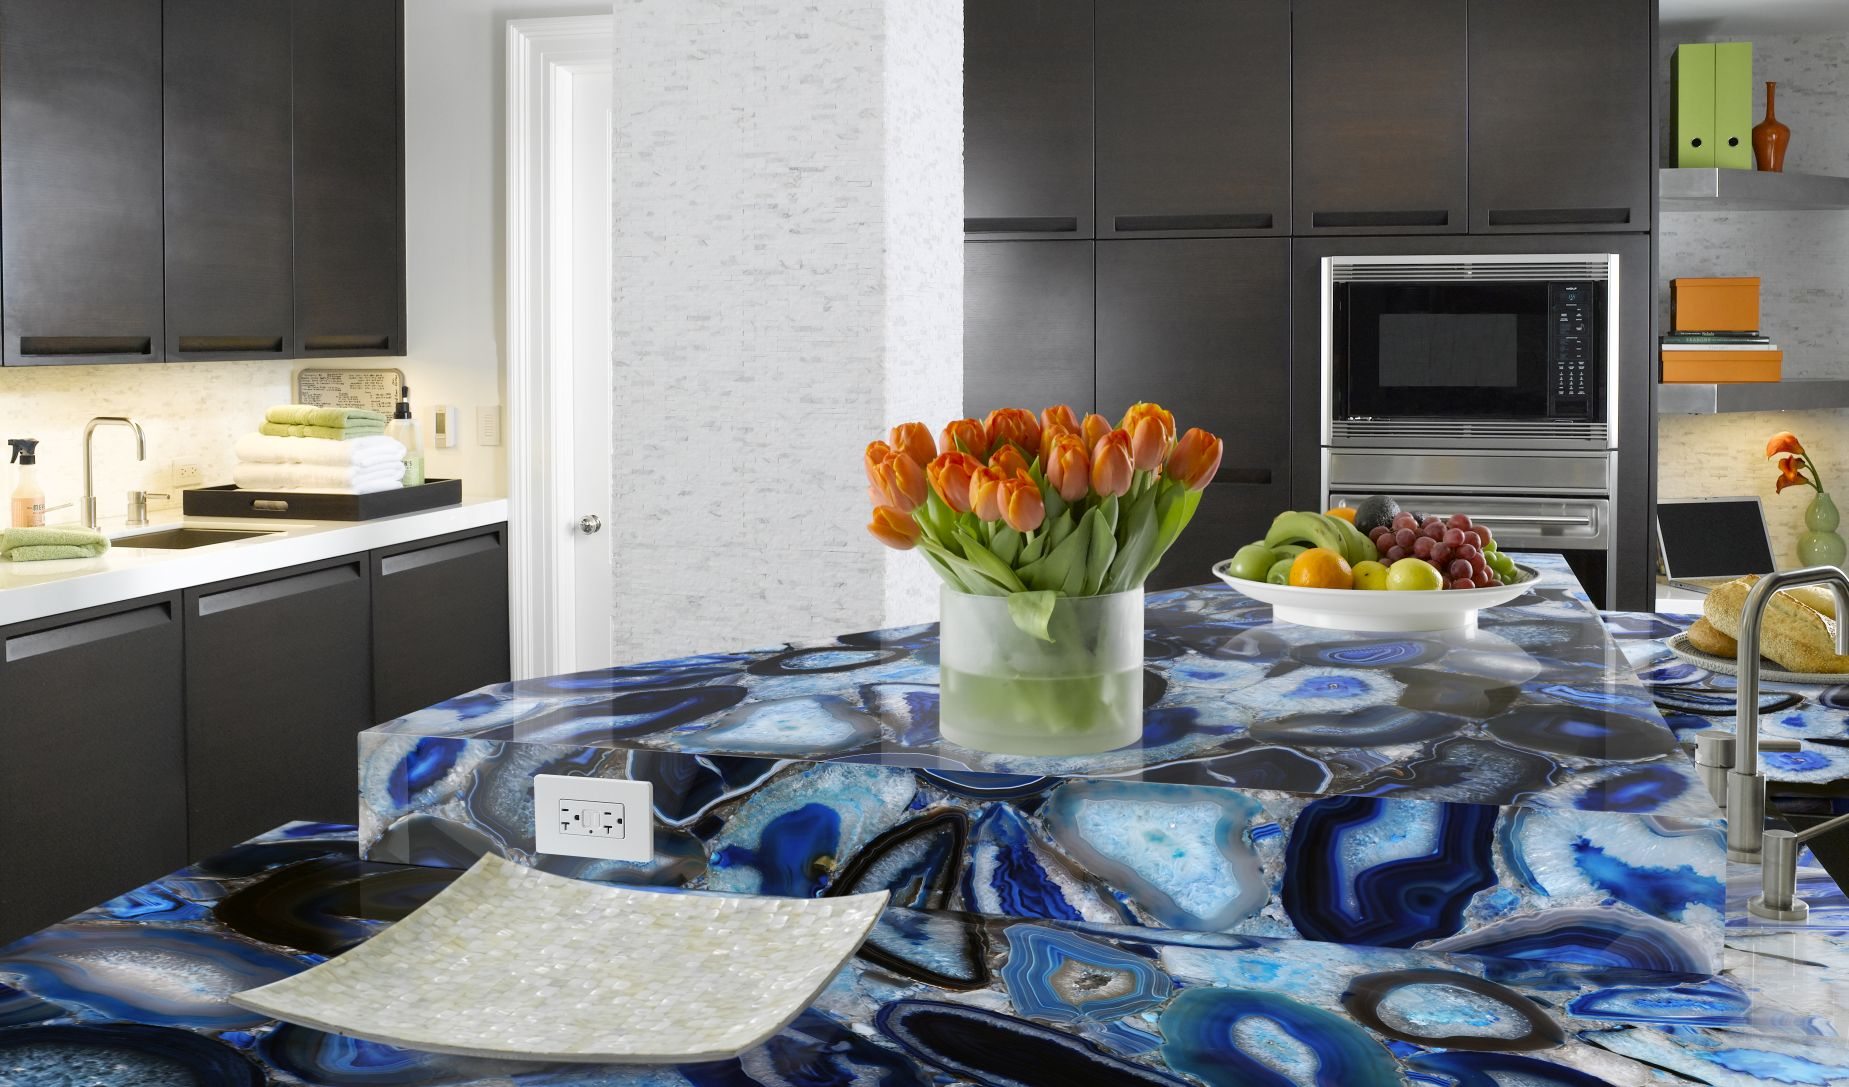 agate blue kitchen countertops